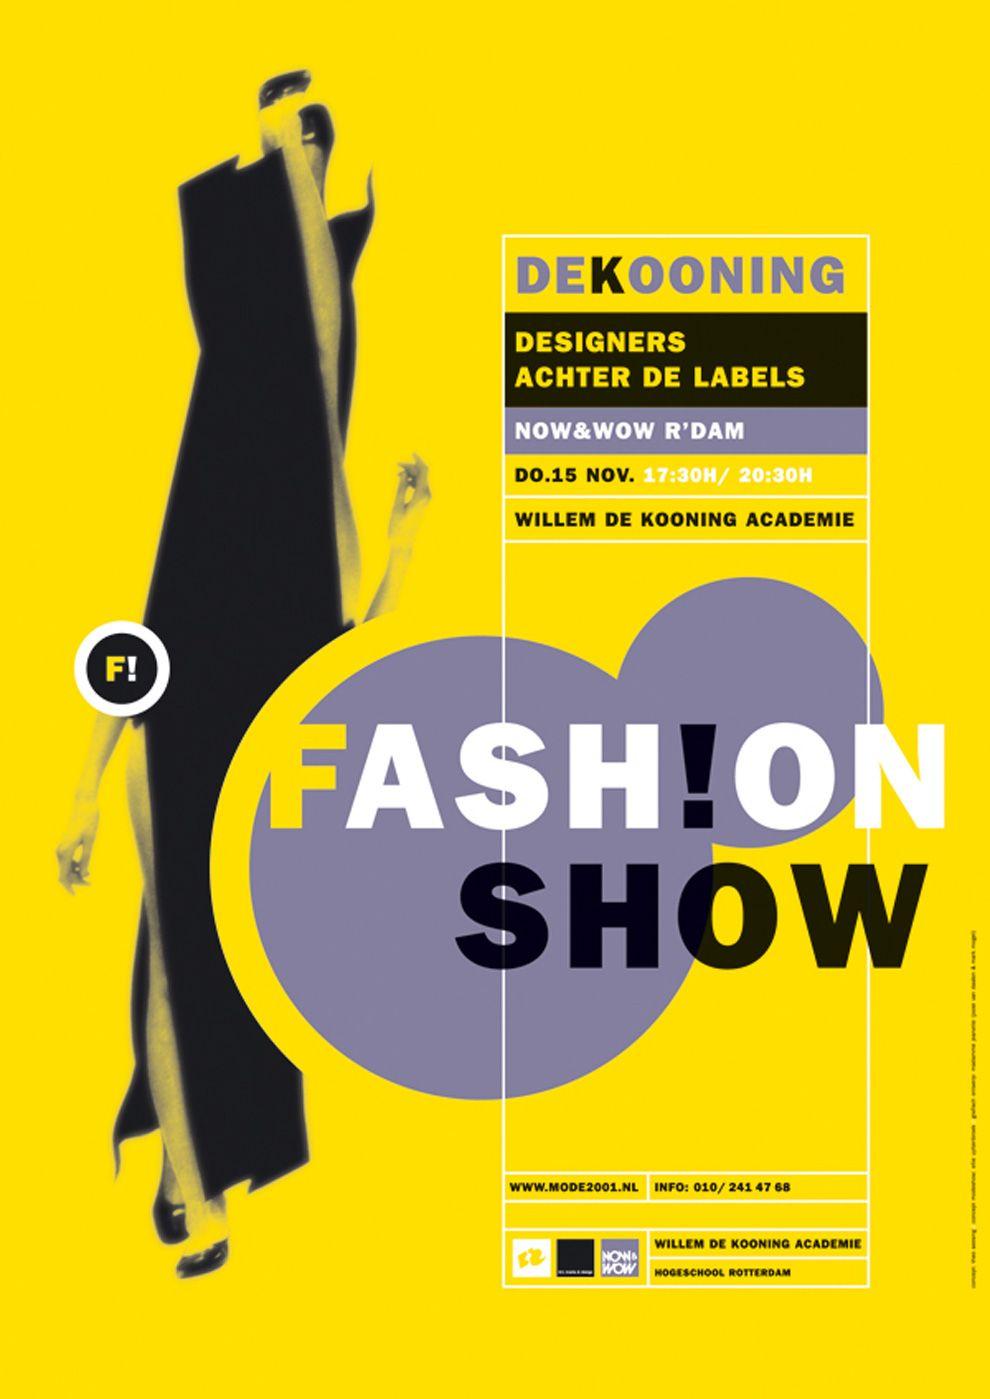 enchilada - typo/graphic posters | Fashion show poster ...